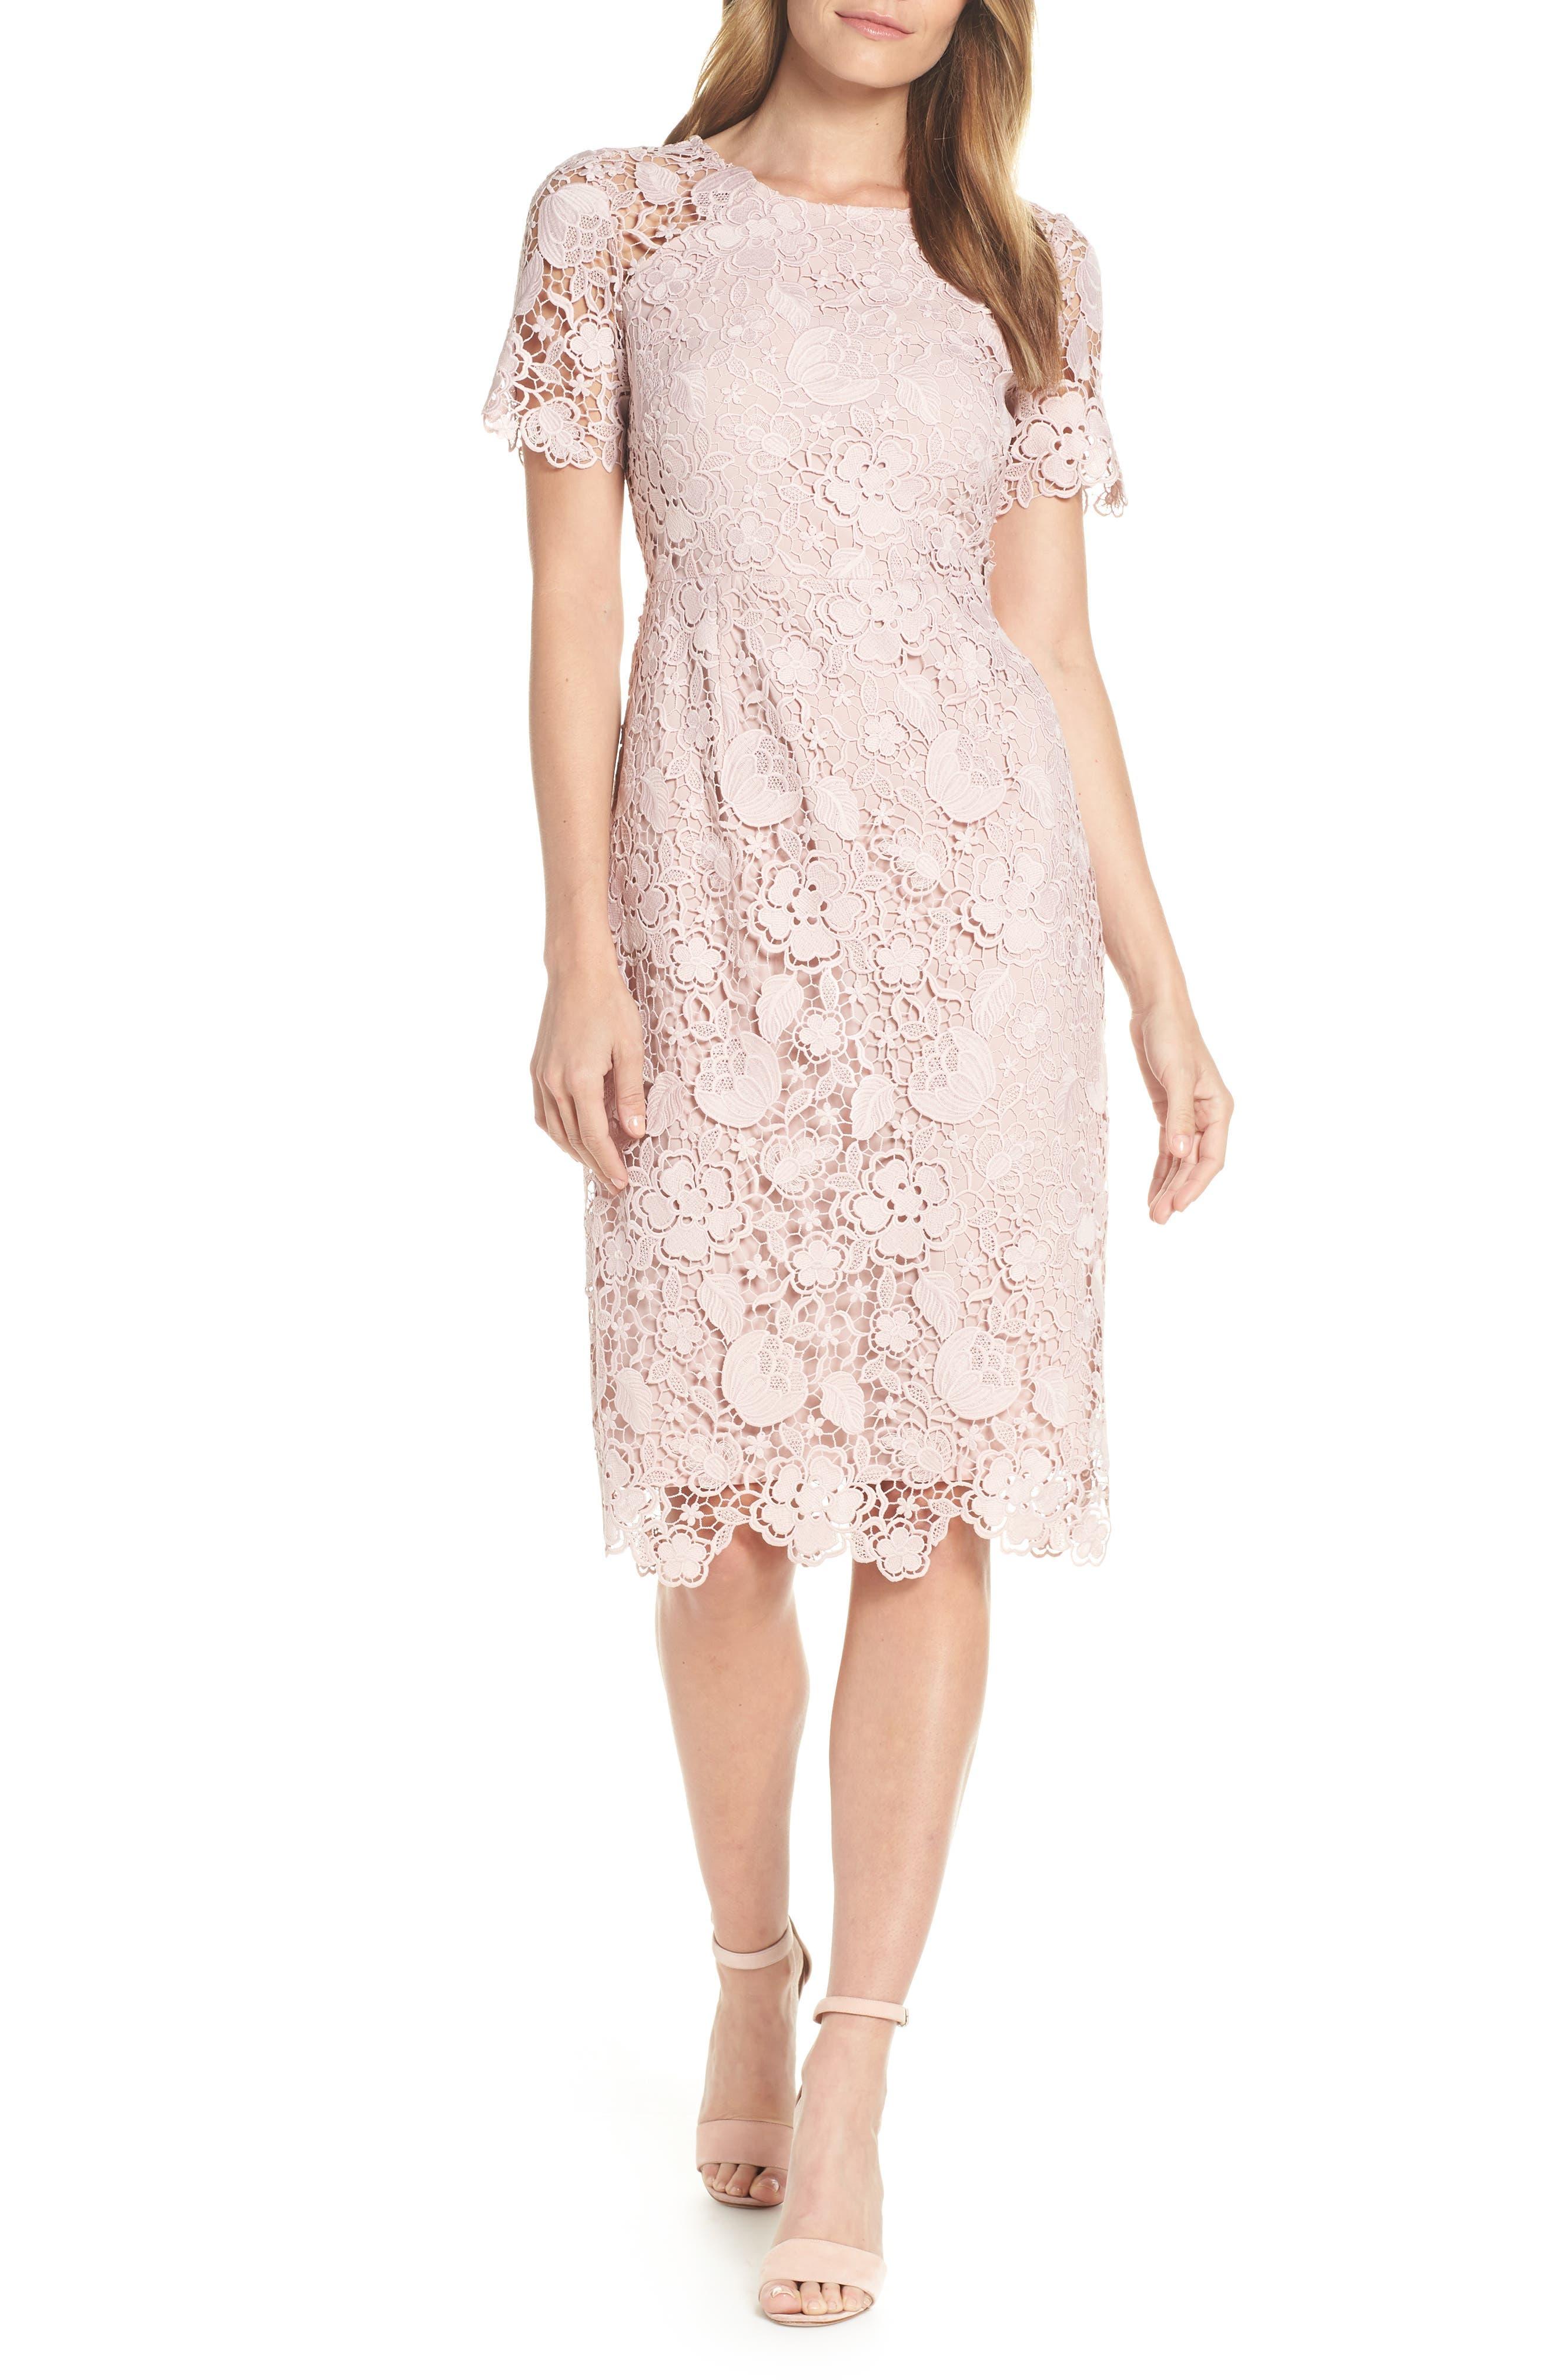 ELIZA J, Embroidered Lace Sheath Dress, Main thumbnail 1, color, NUDE